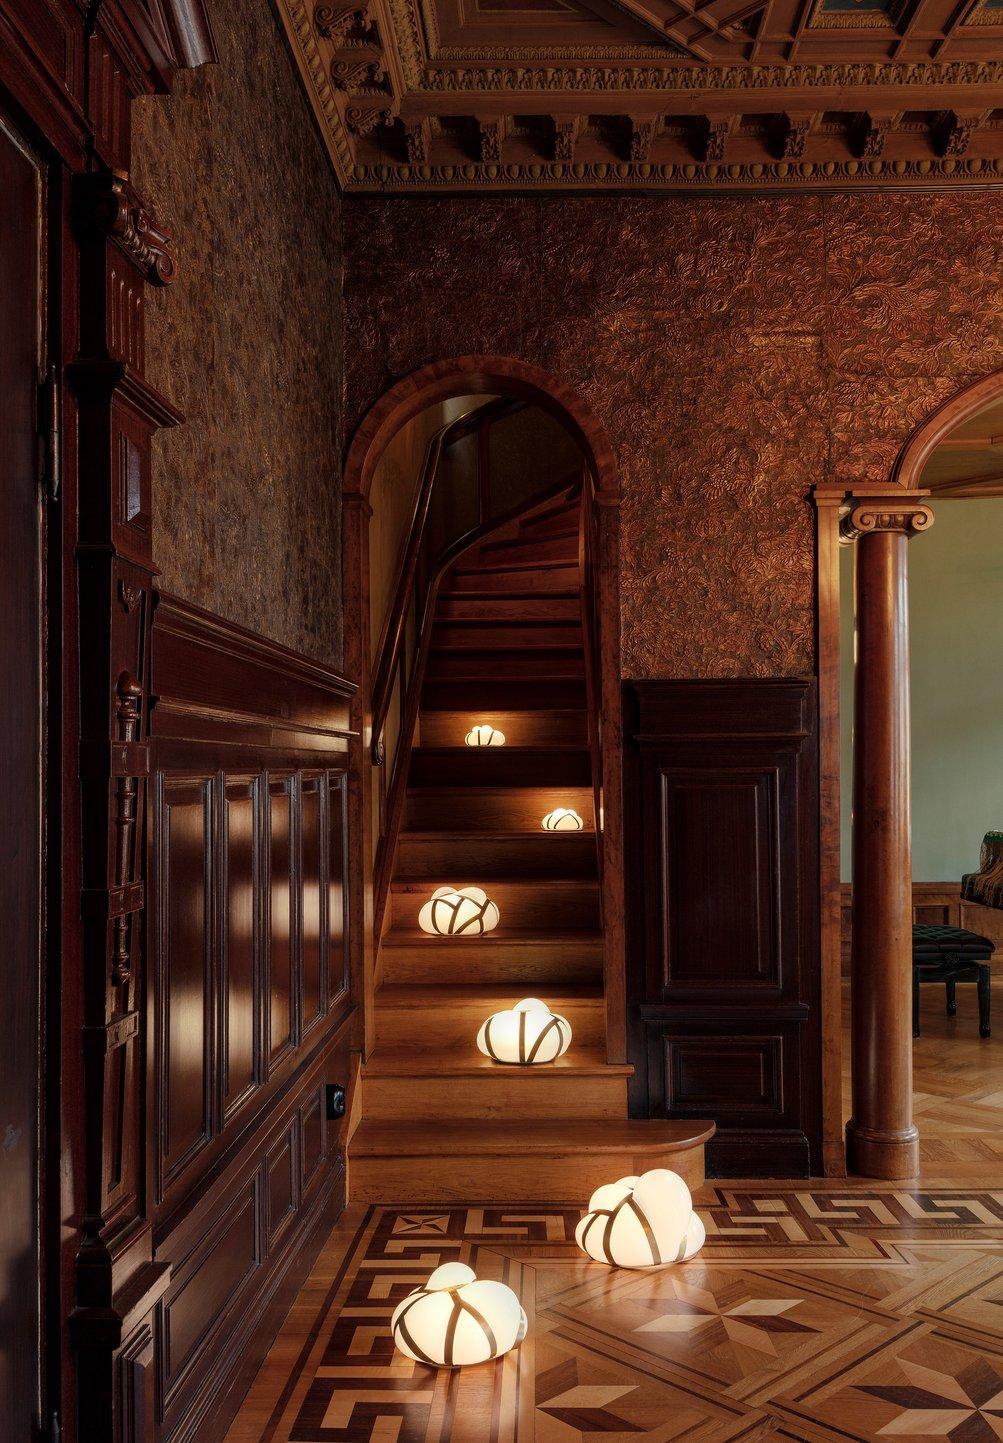 bakers-house-stockholm-design-week-farg-blanche-interiors-installations-_dezeen_2364_col_8